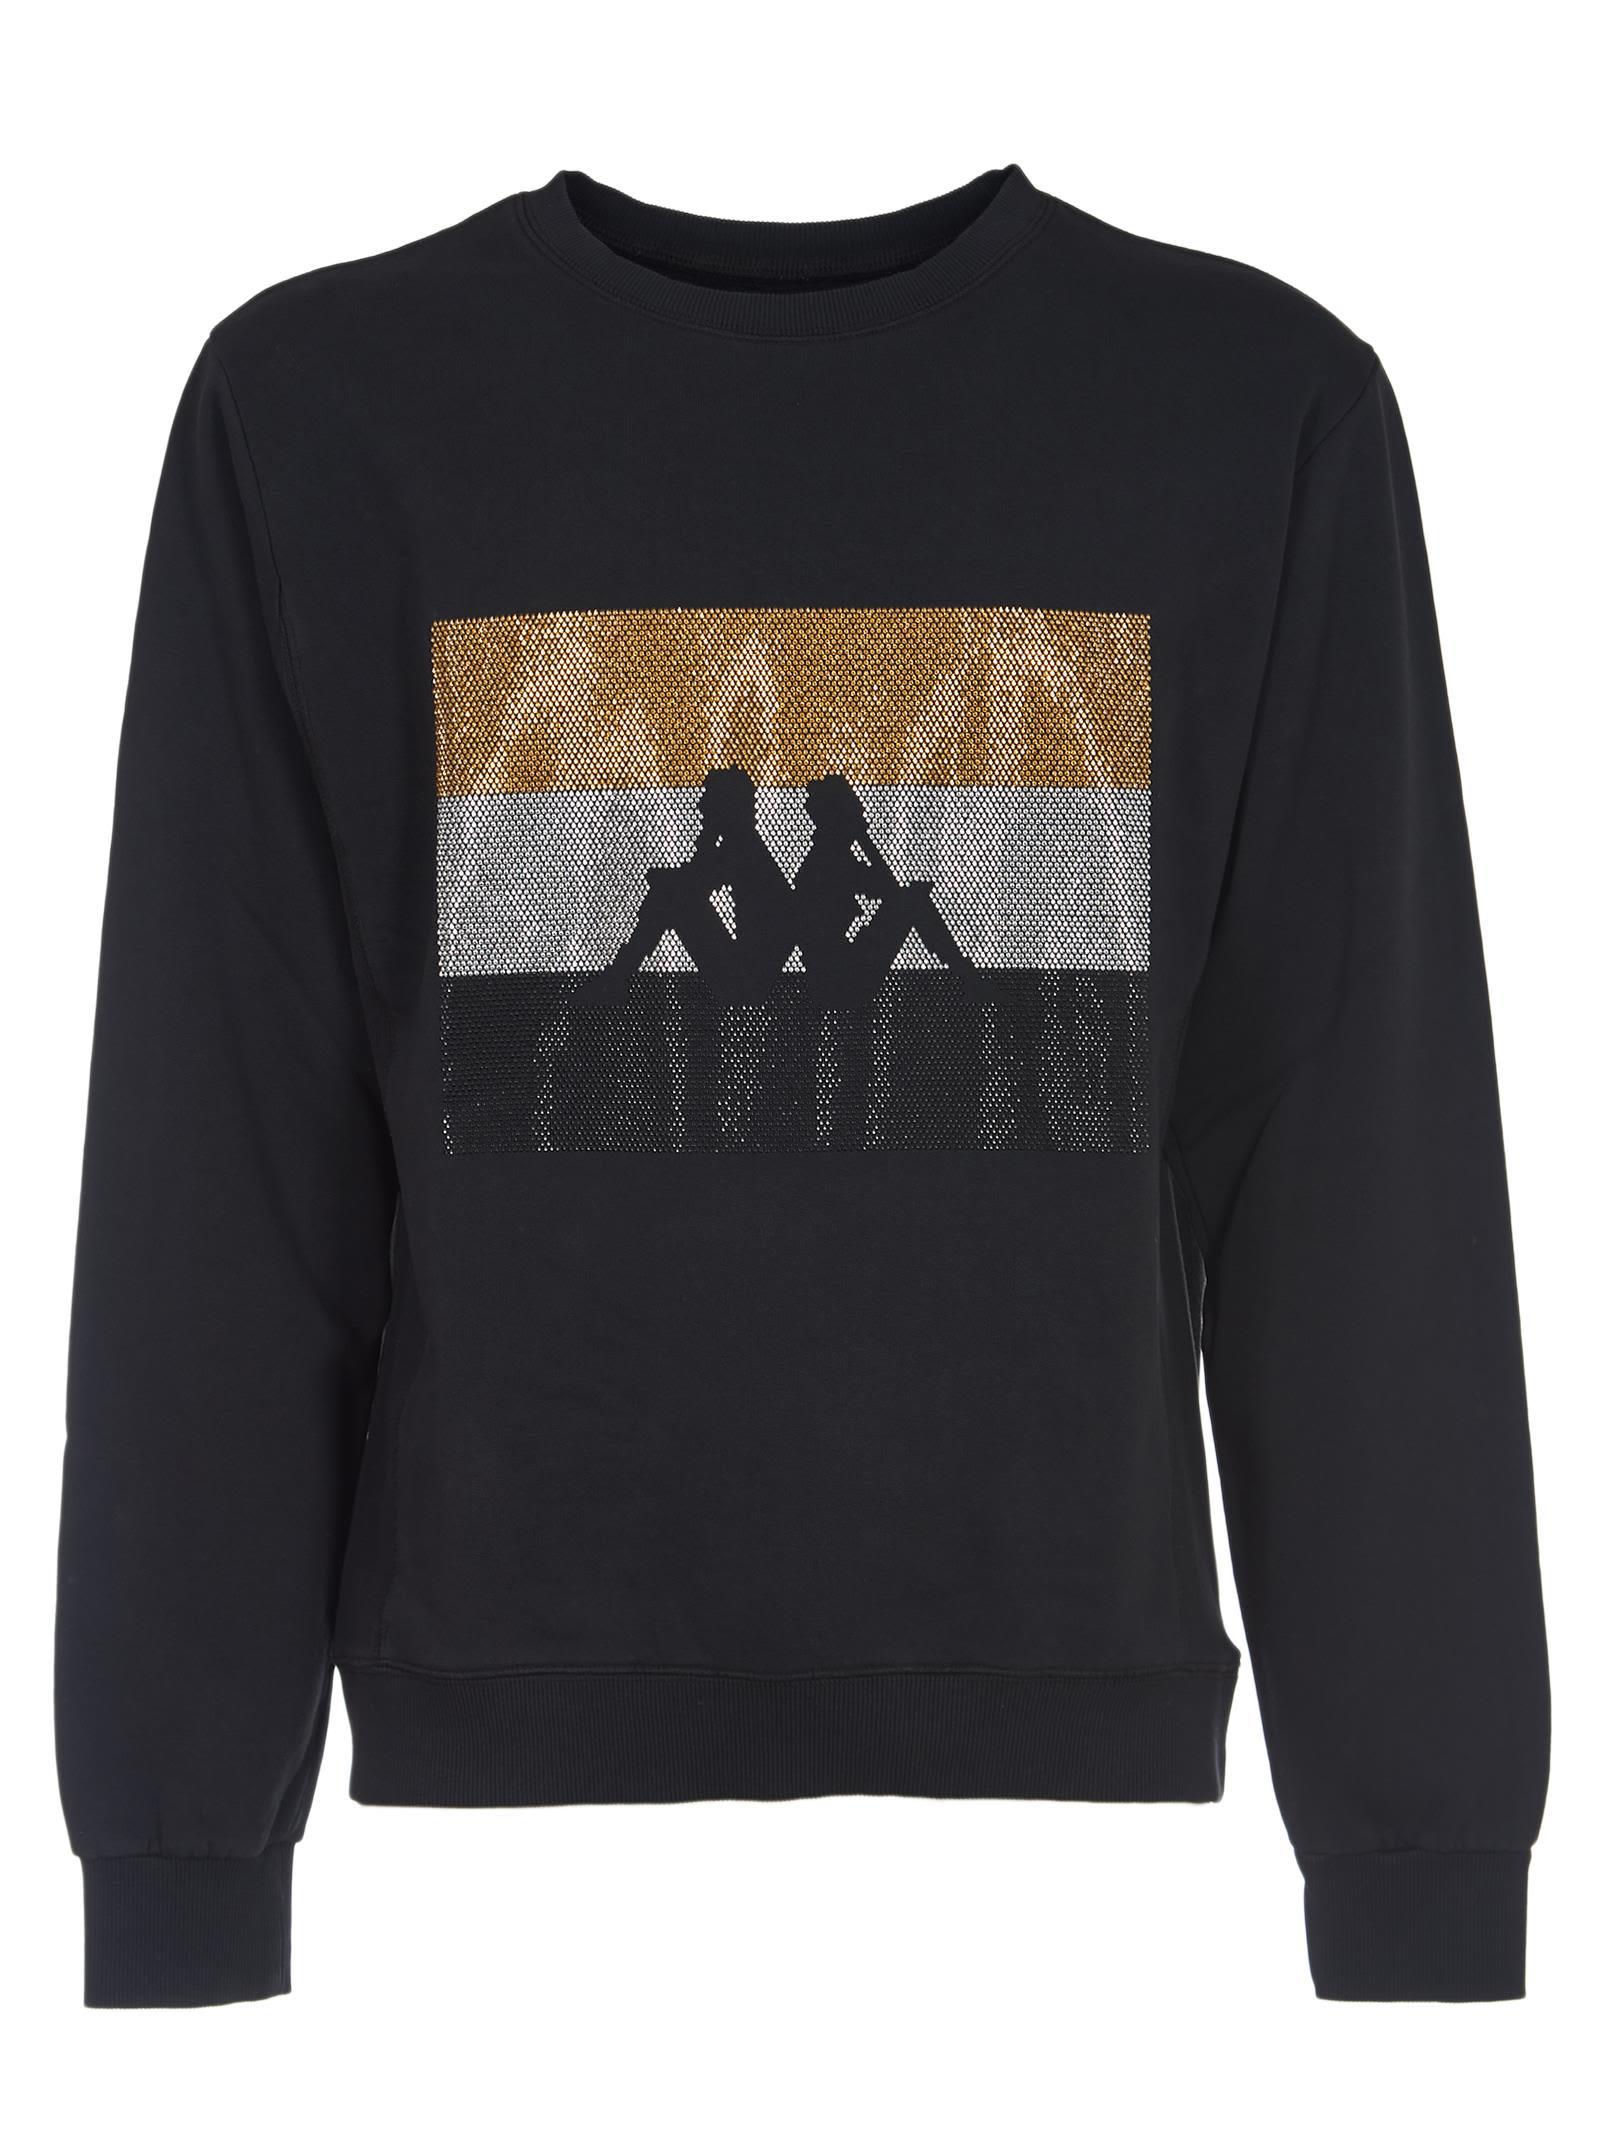 DANILO PAURA Logo Sweatshirt in Black